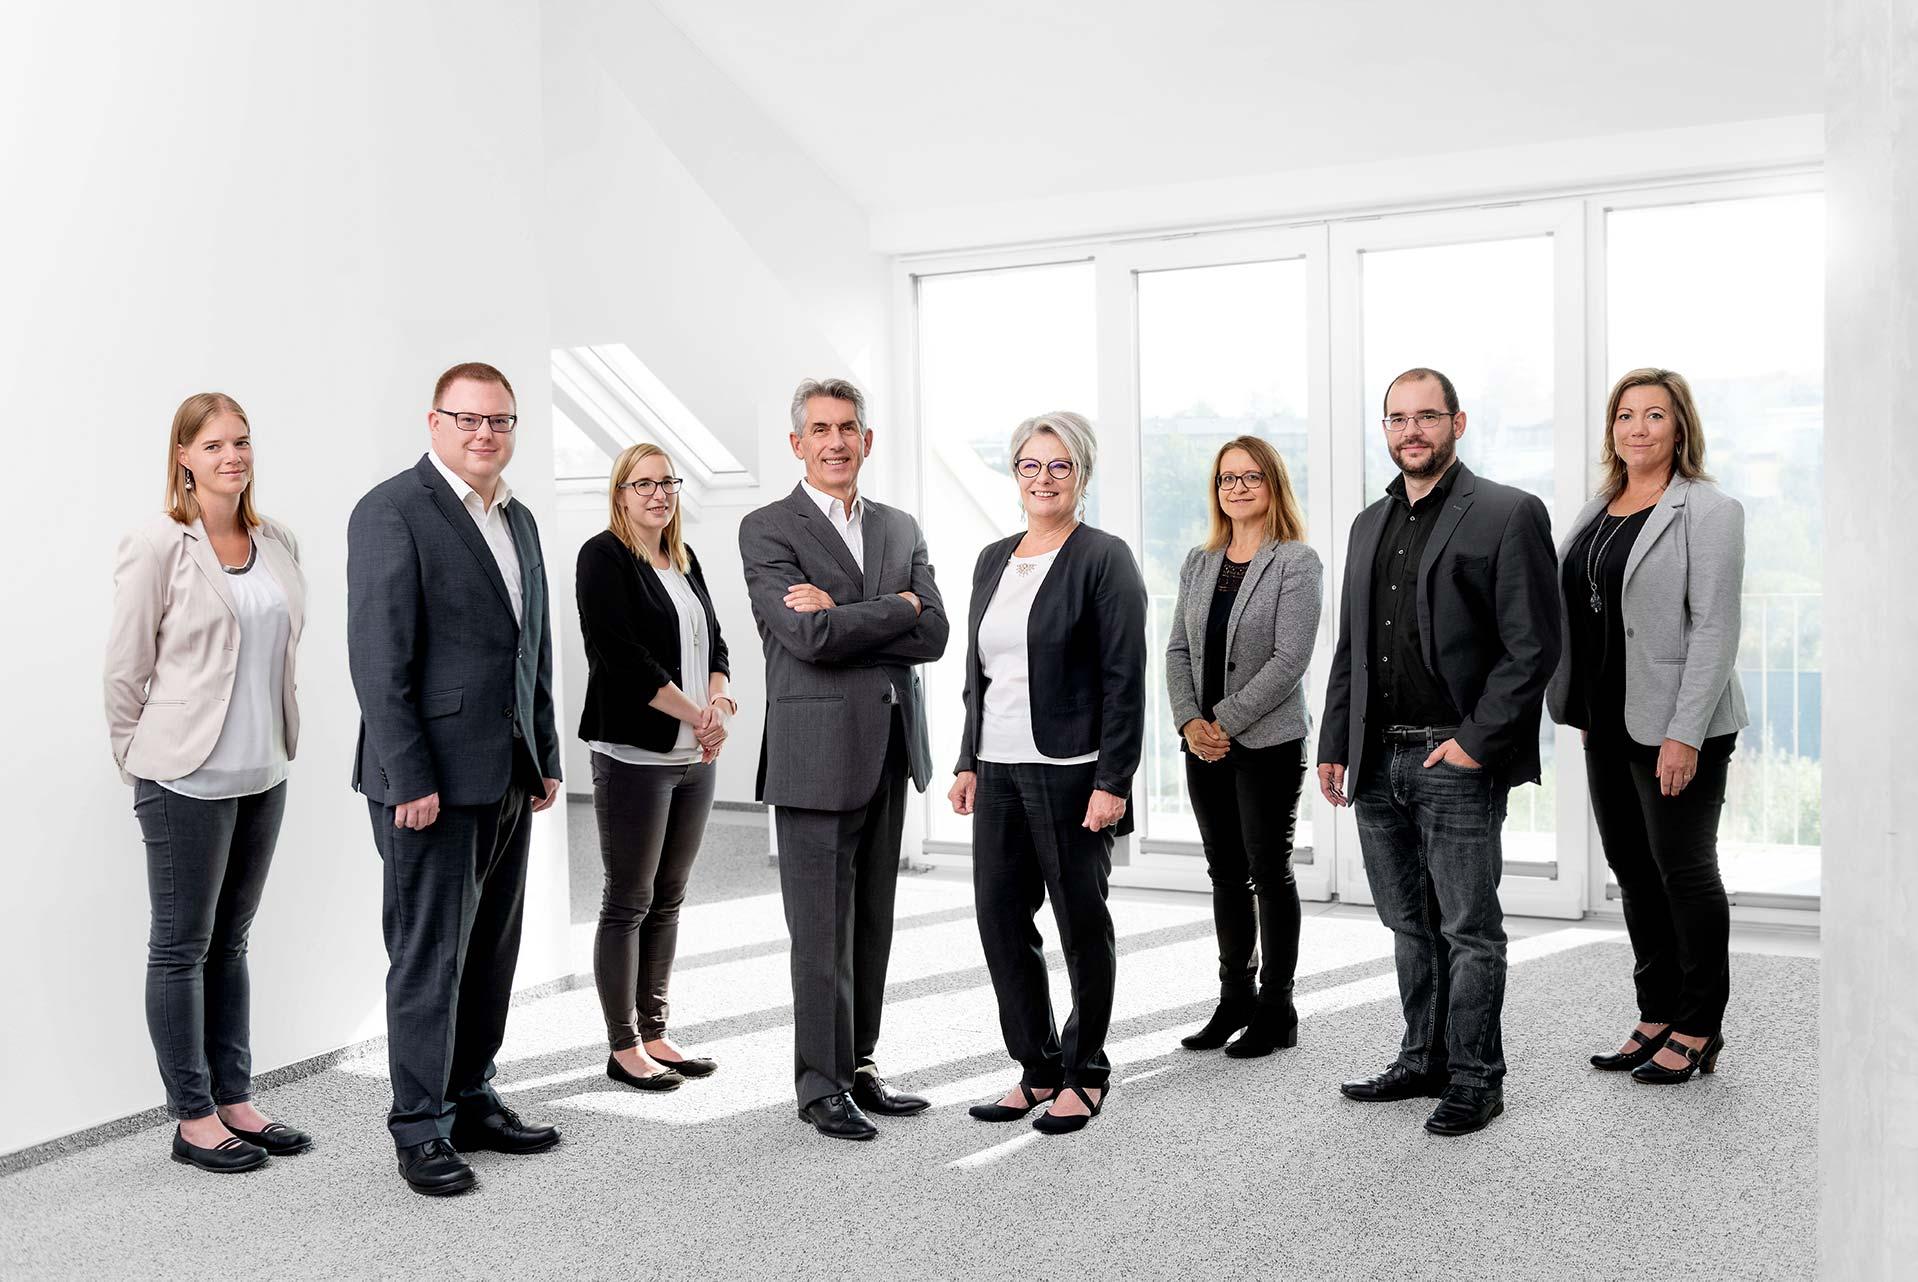 Anwalt Zwettl - Team - Roessler Rechtsanwalt und Mediation